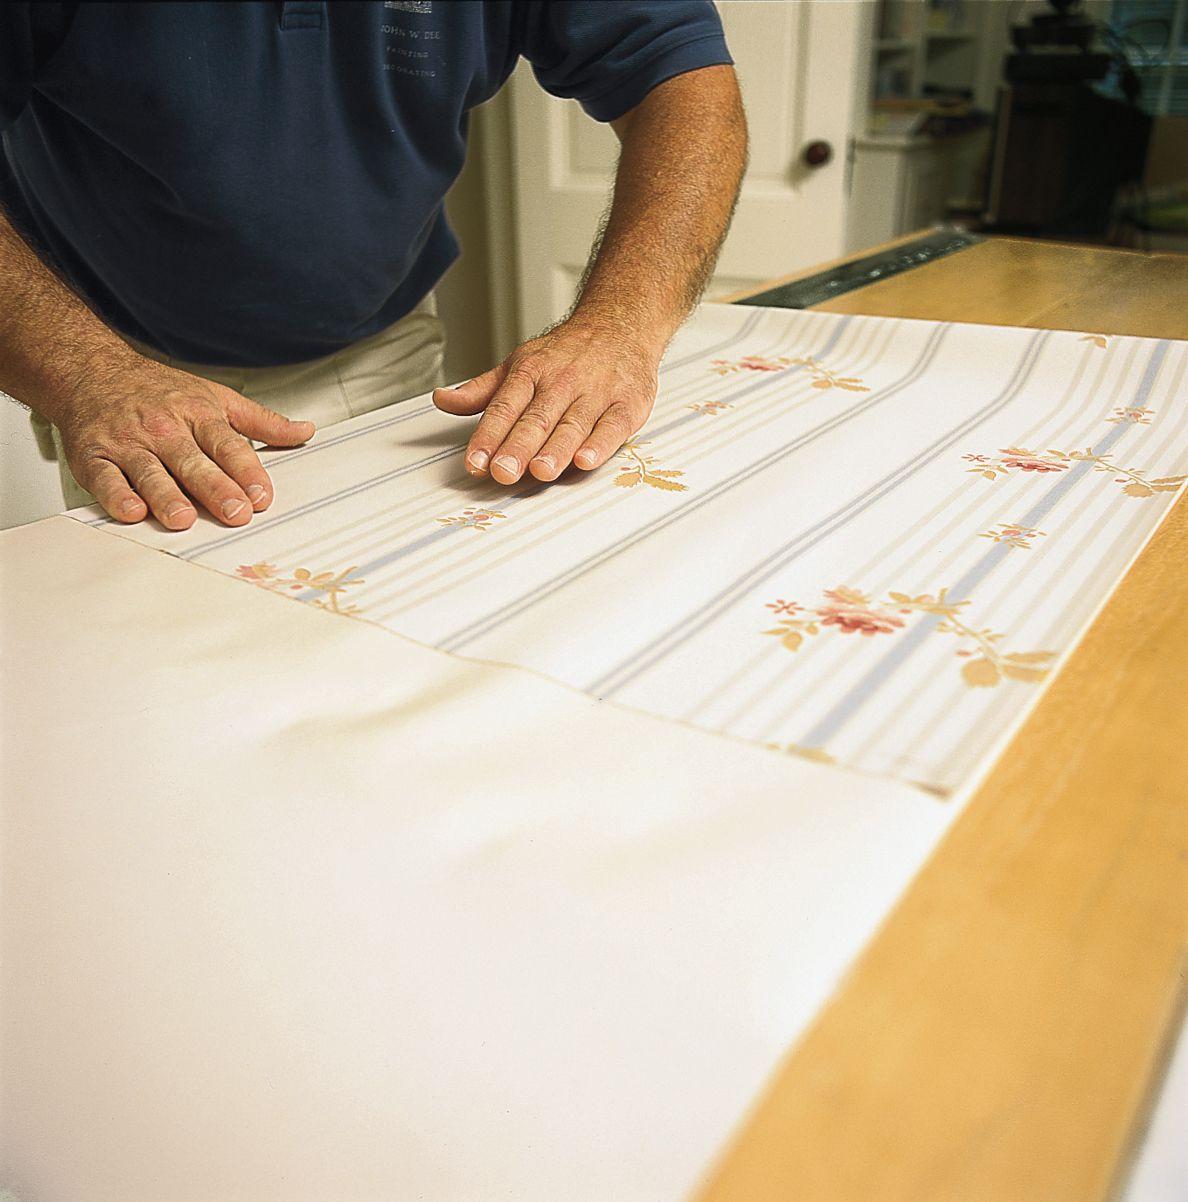 Prepping Wallpaper